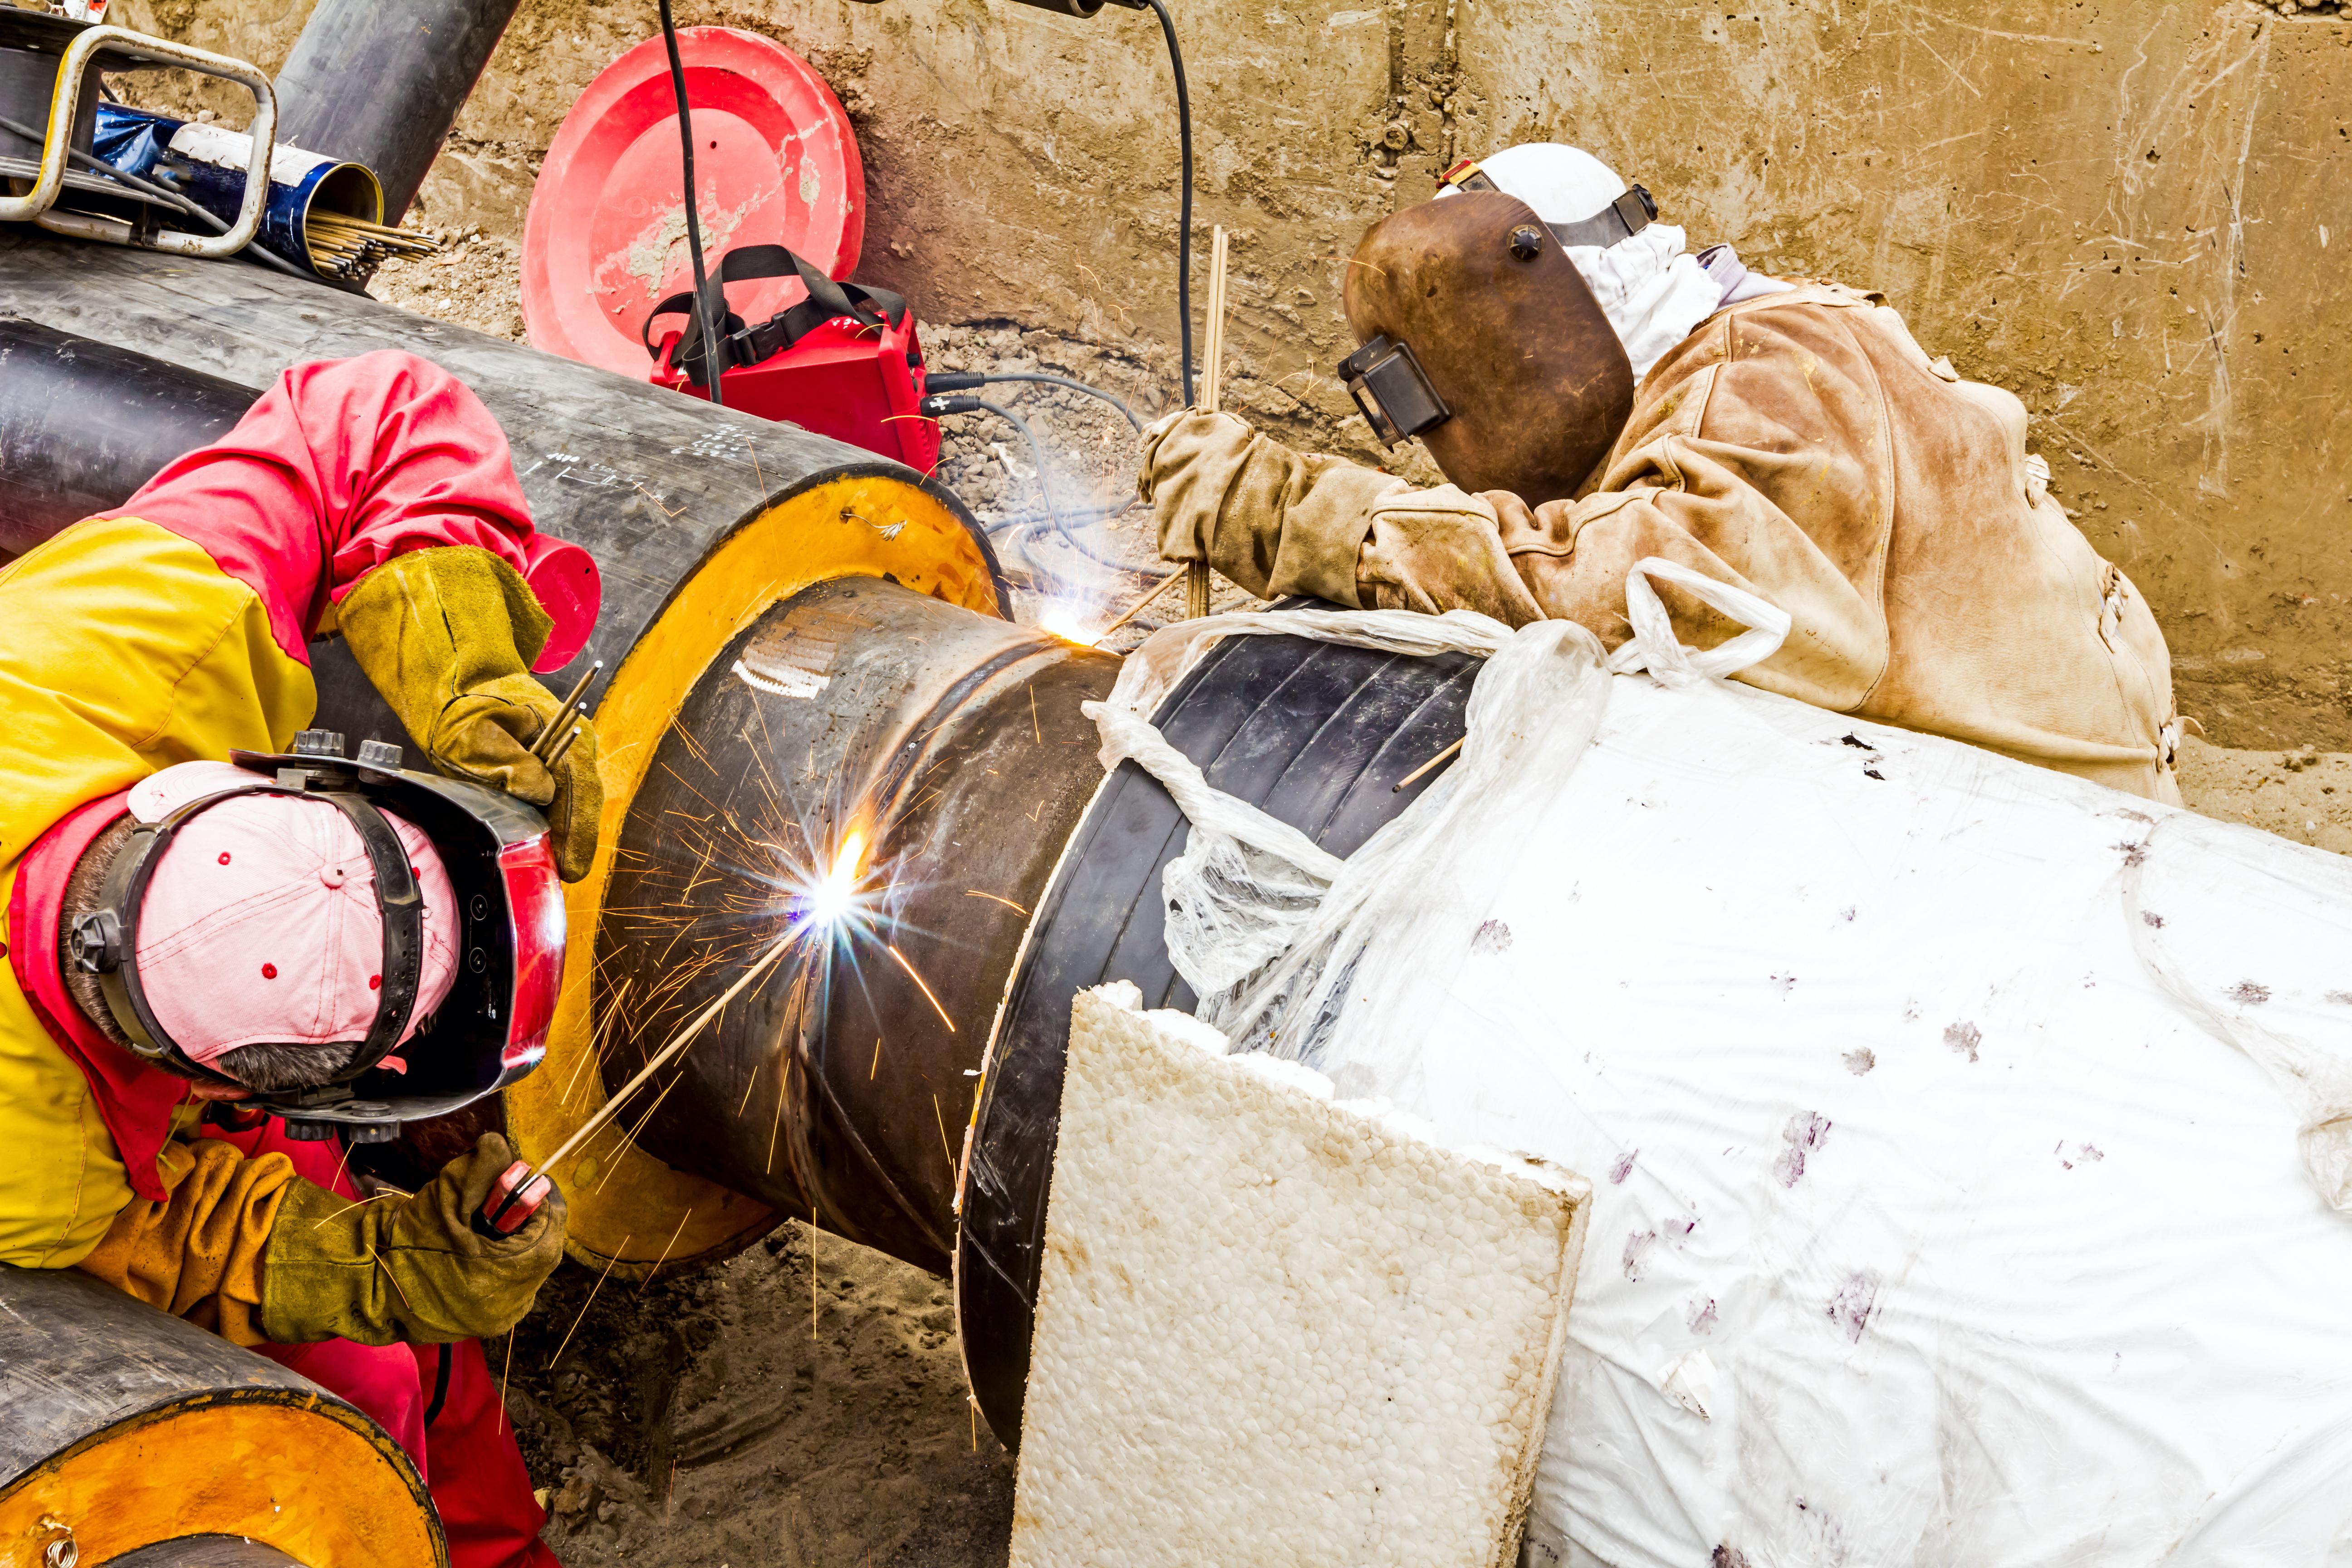 A team of welders working on a pipeline.